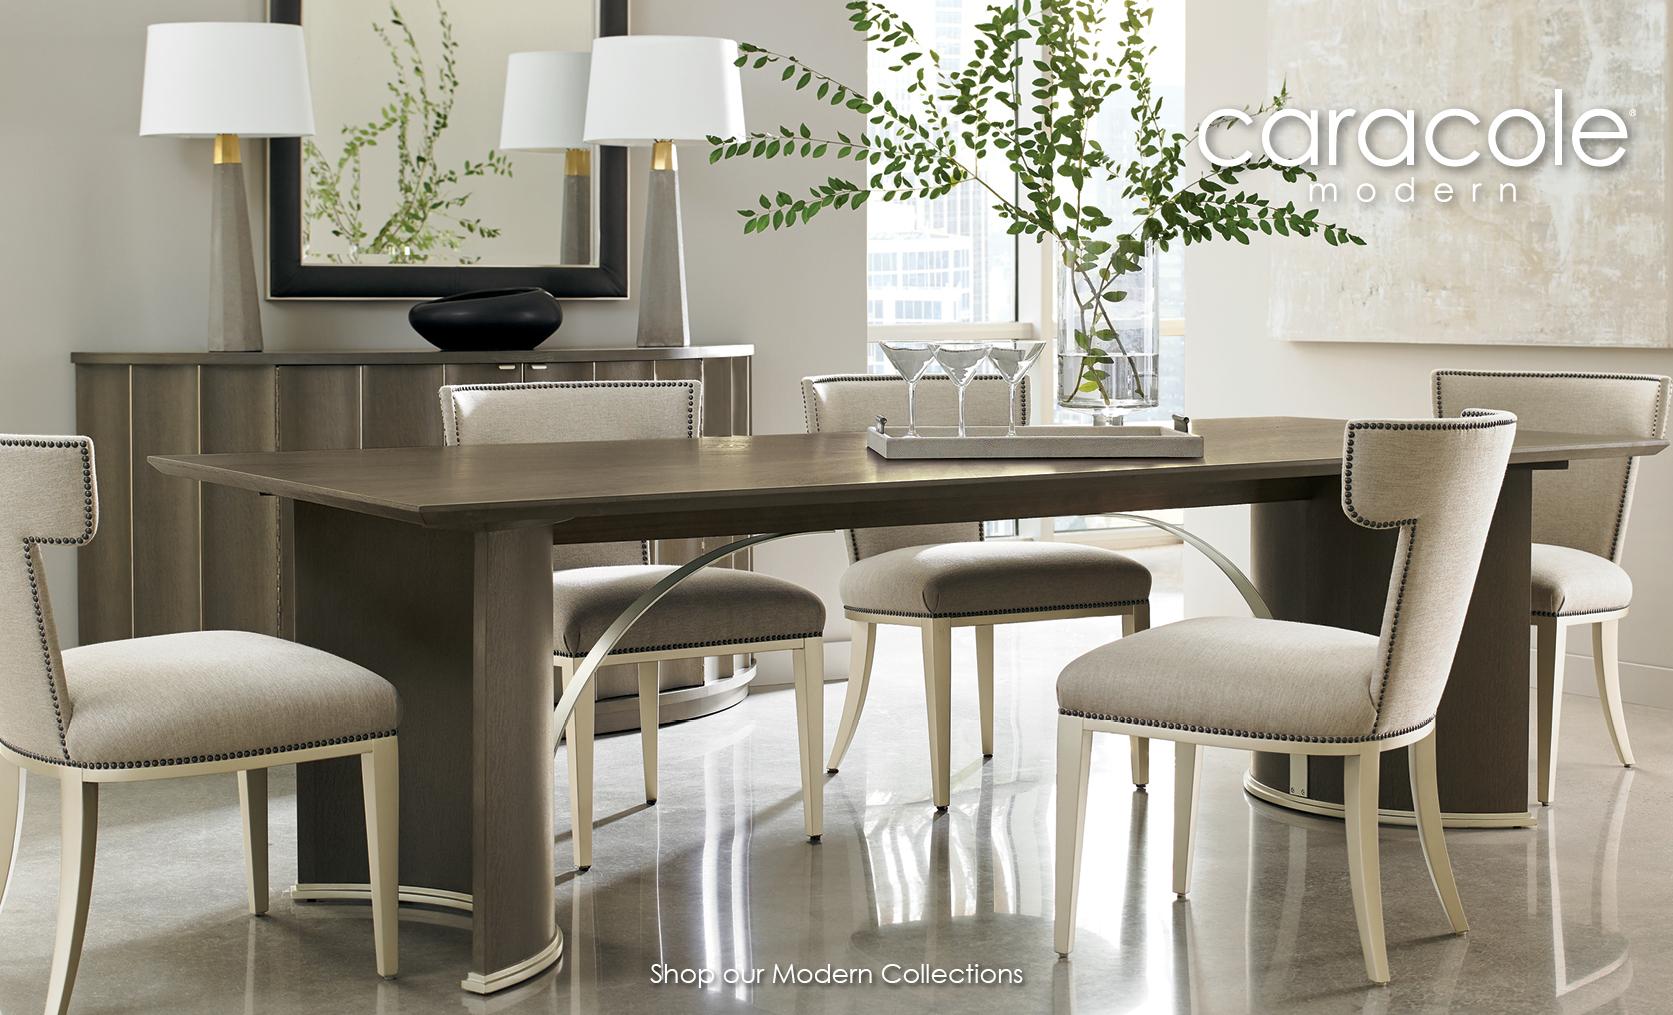 how do you caracole with salon de jardin manhattan. Black Bedroom Furniture Sets. Home Design Ideas